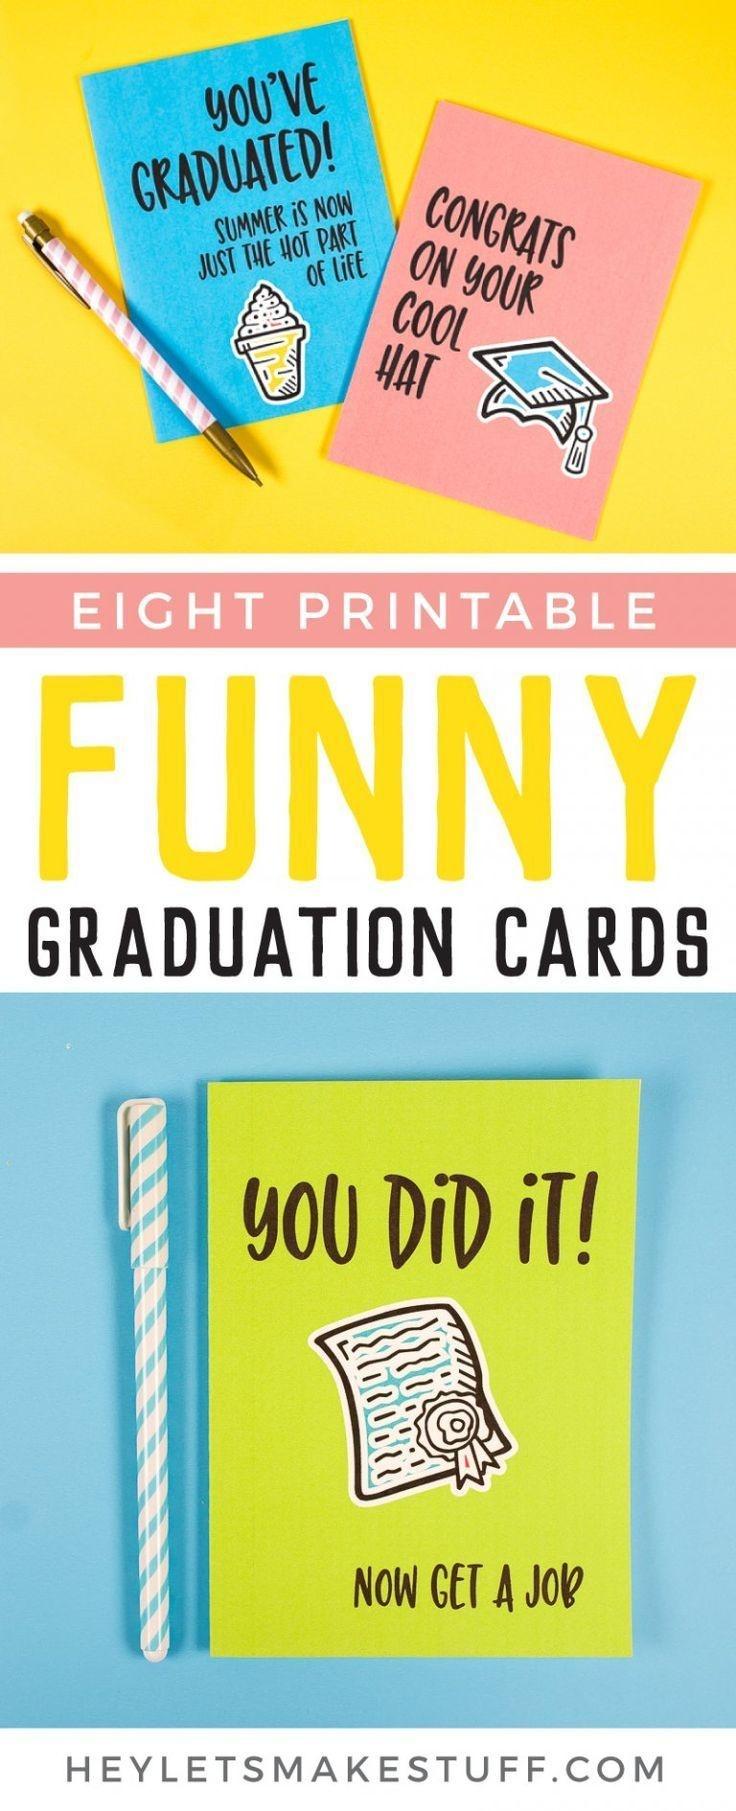 Printable Funny Graduation Cards | Freebies-Printables And Downloads - Graduation Cards Free Printable Funny